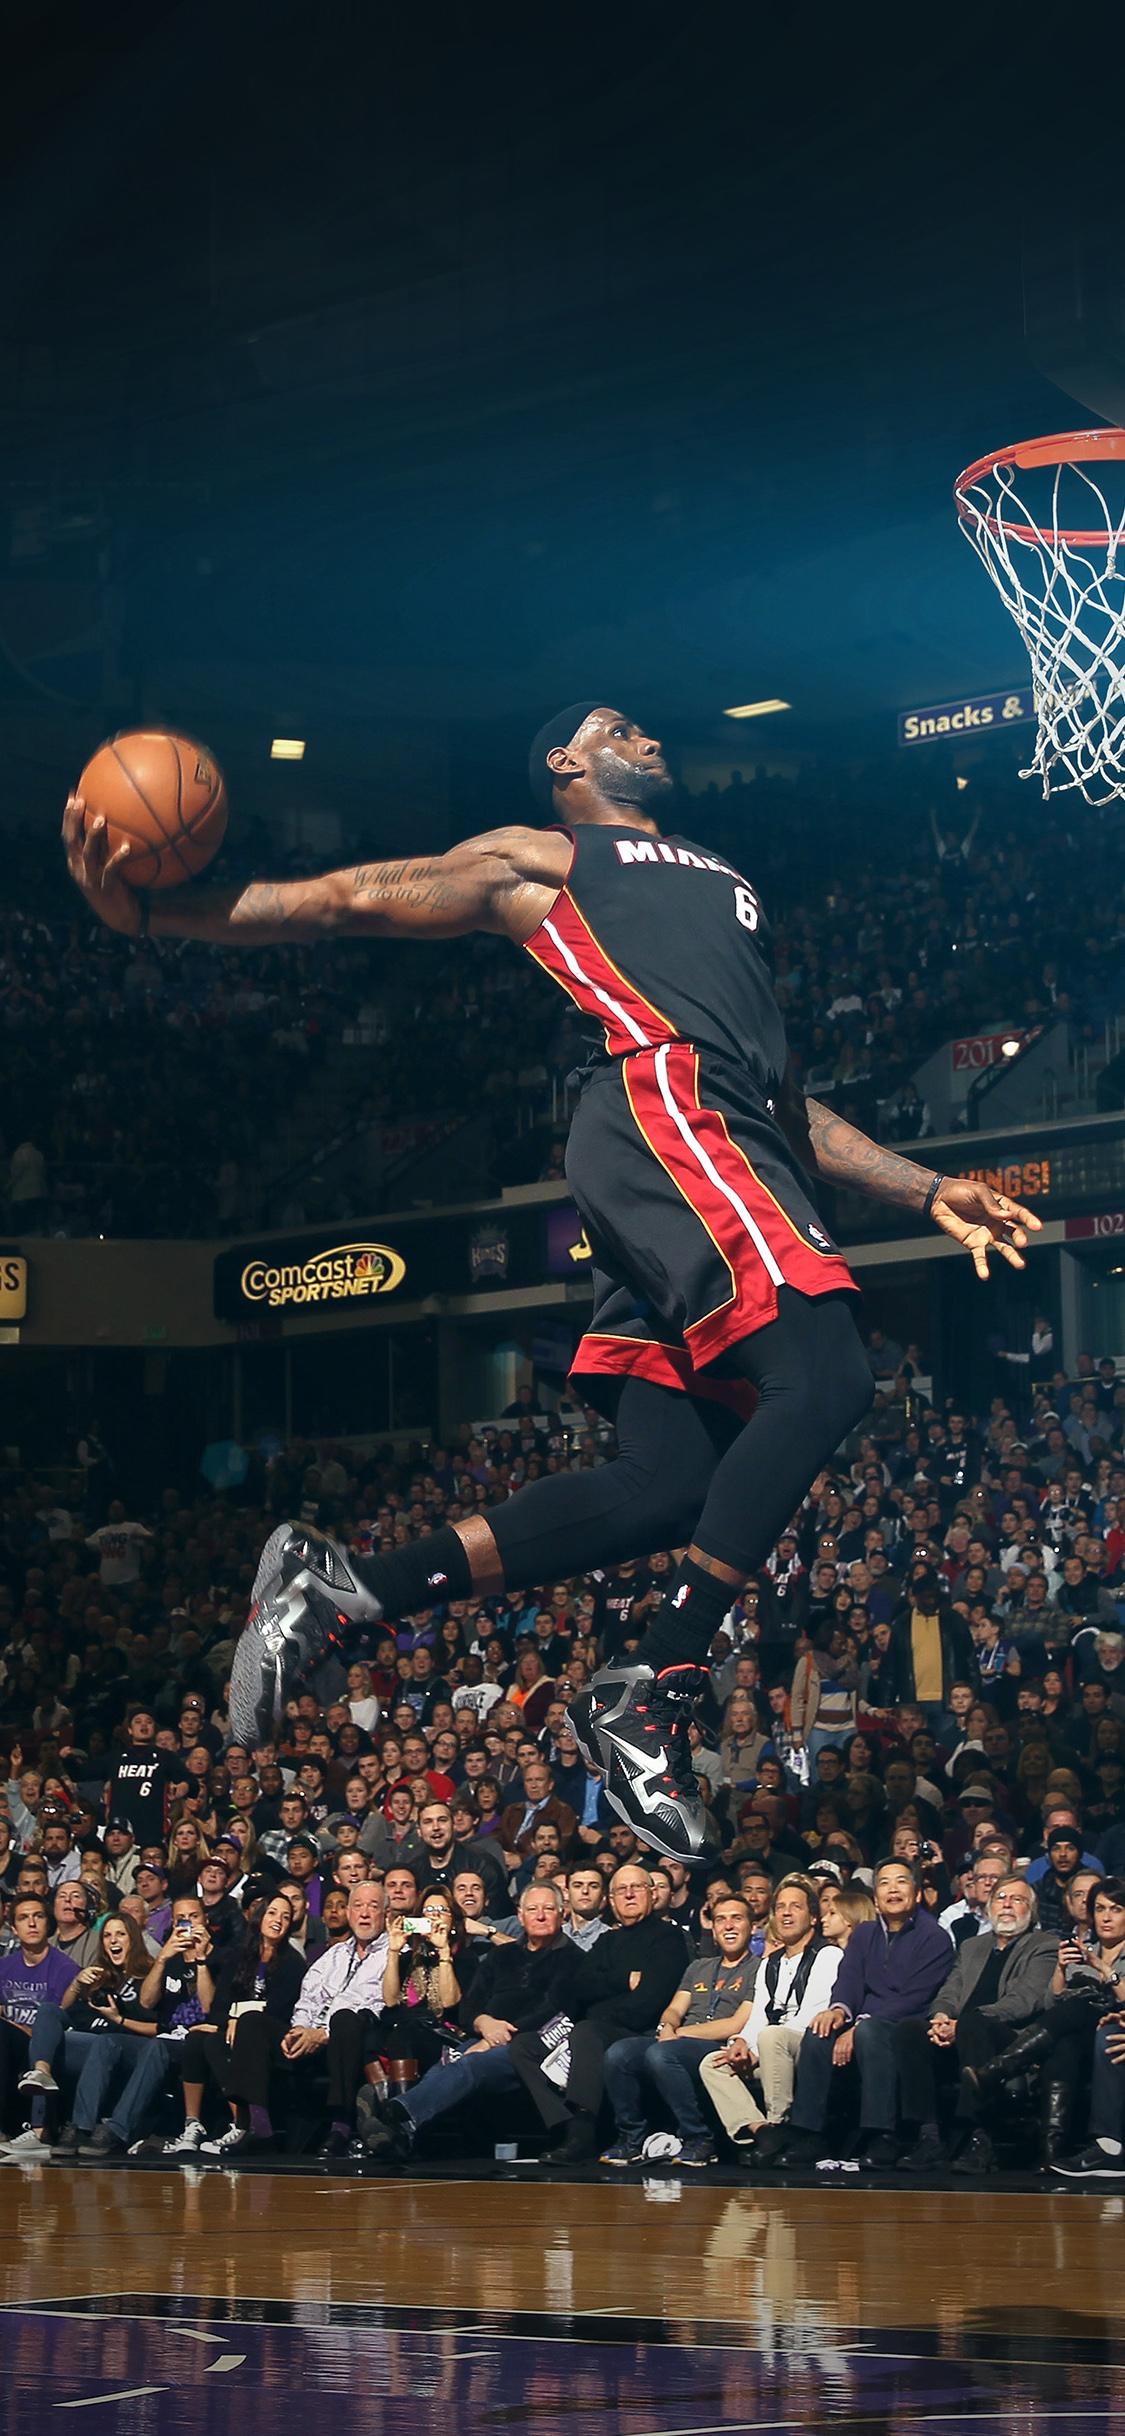 Hf00 Lebron James Dunk Nba Sports Art Flare Basketball Papers Co